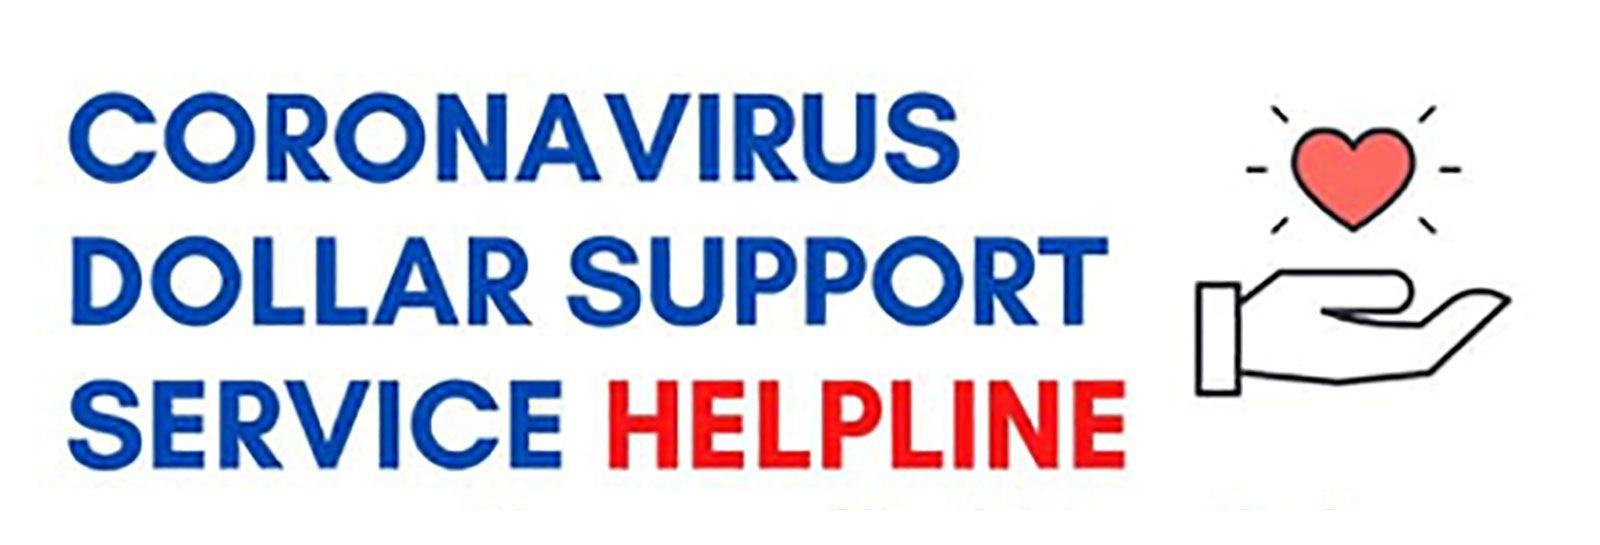 Dollar Support Service Helpline logo banner image